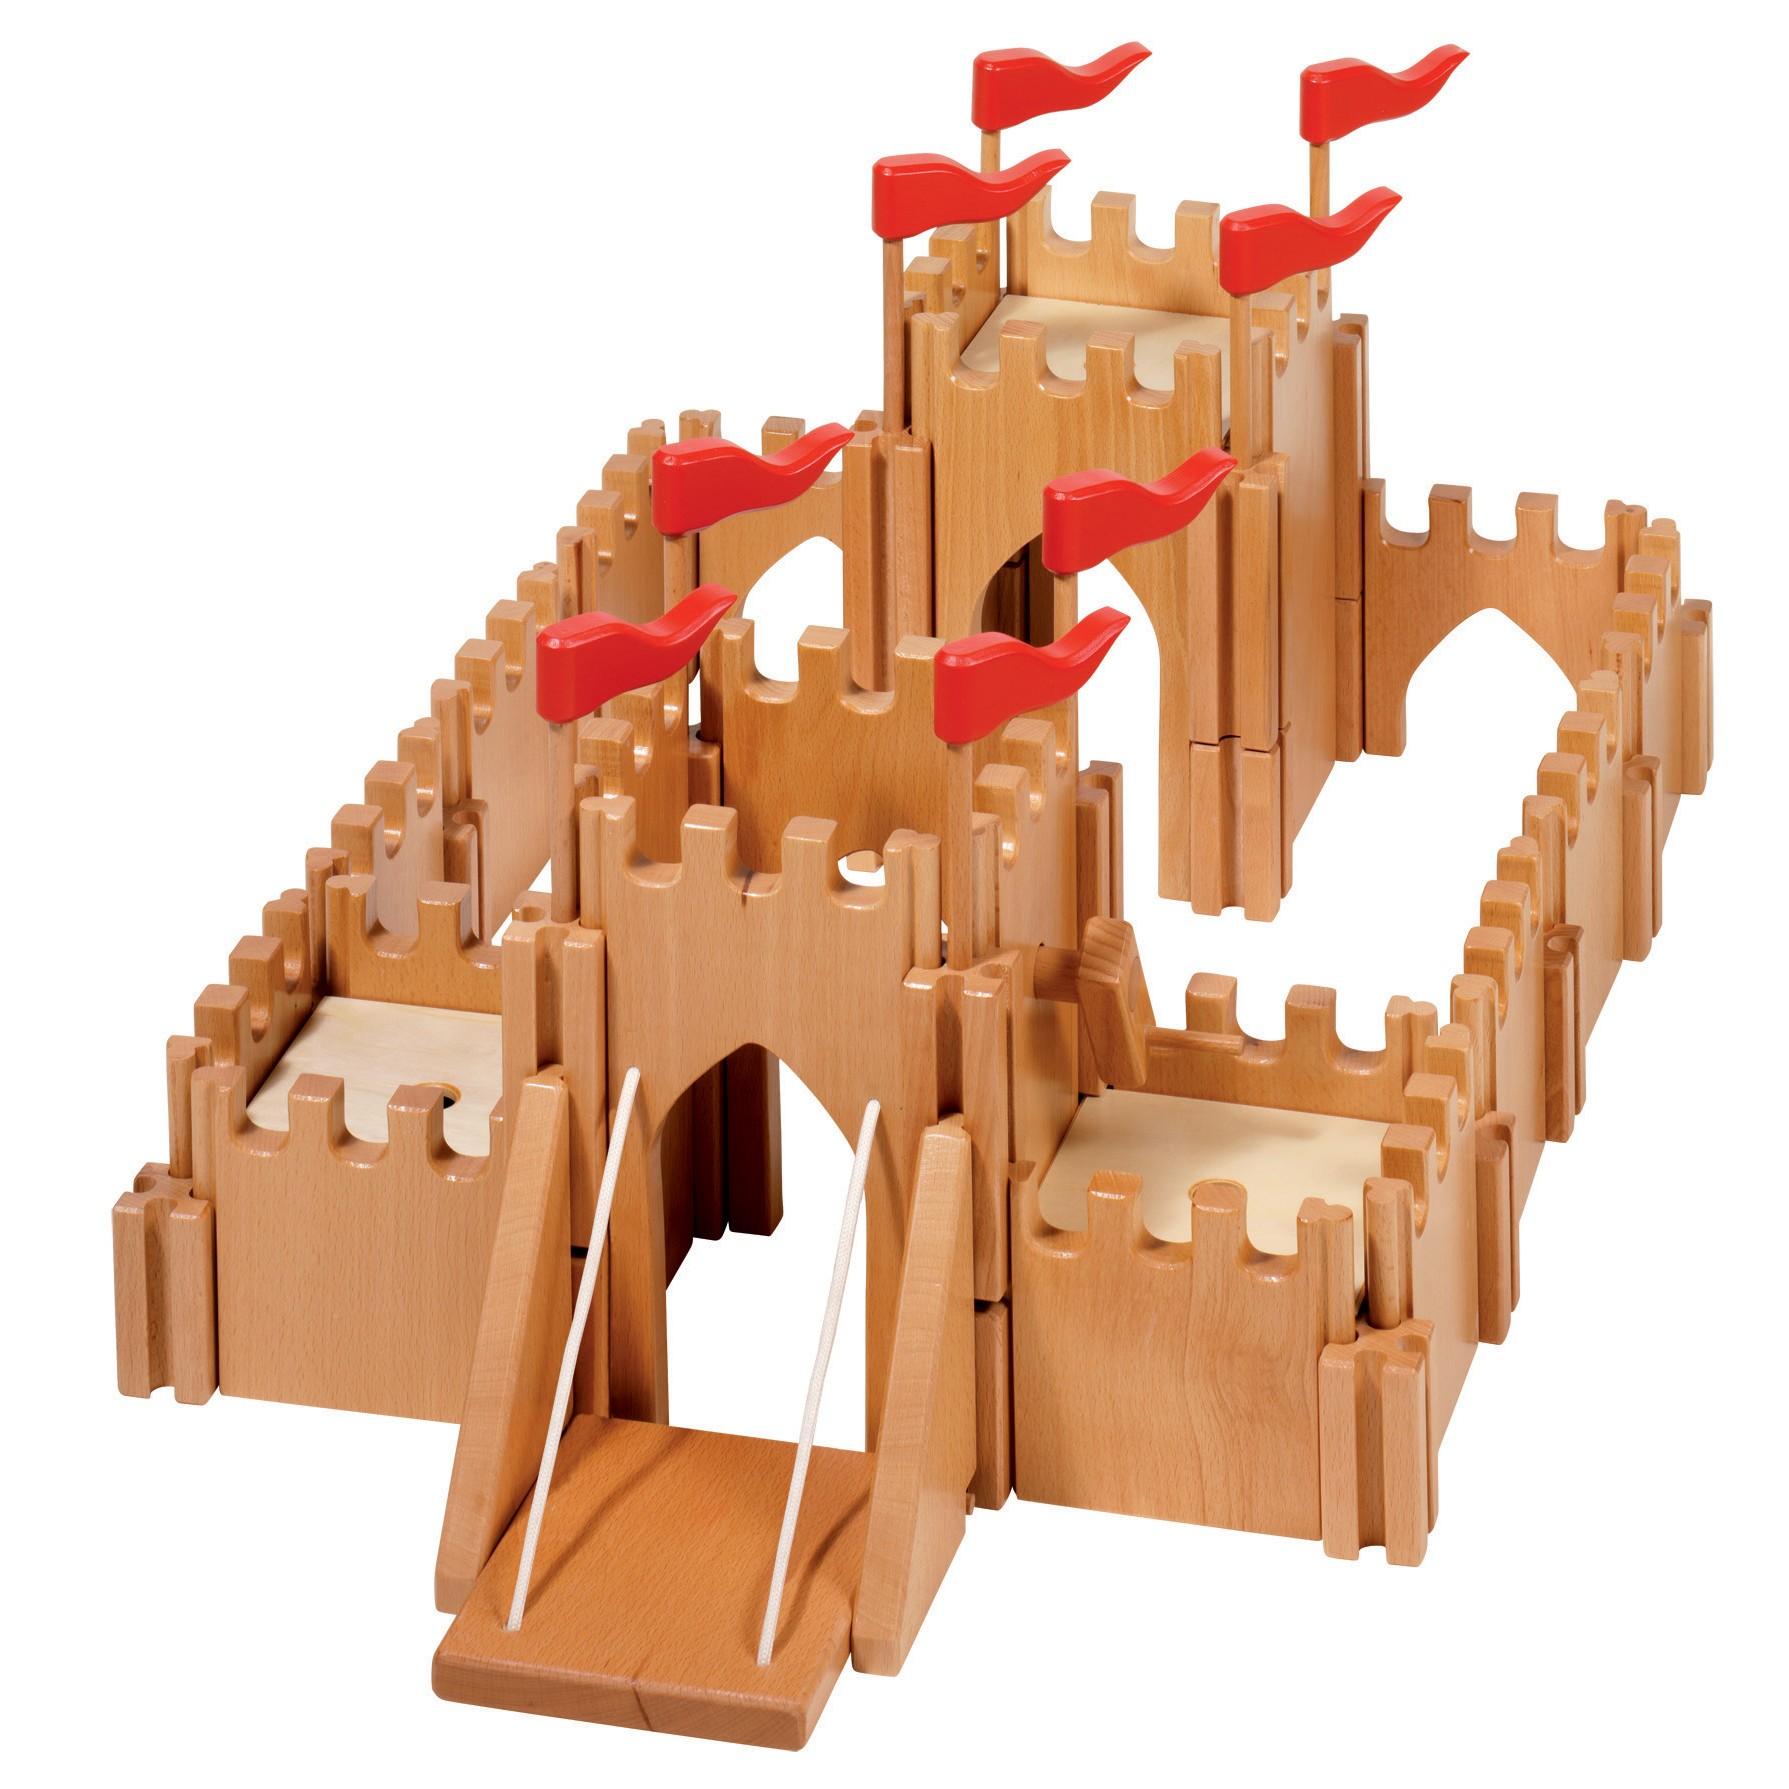 Wooden Toys Catalog : Holztiger knights castle